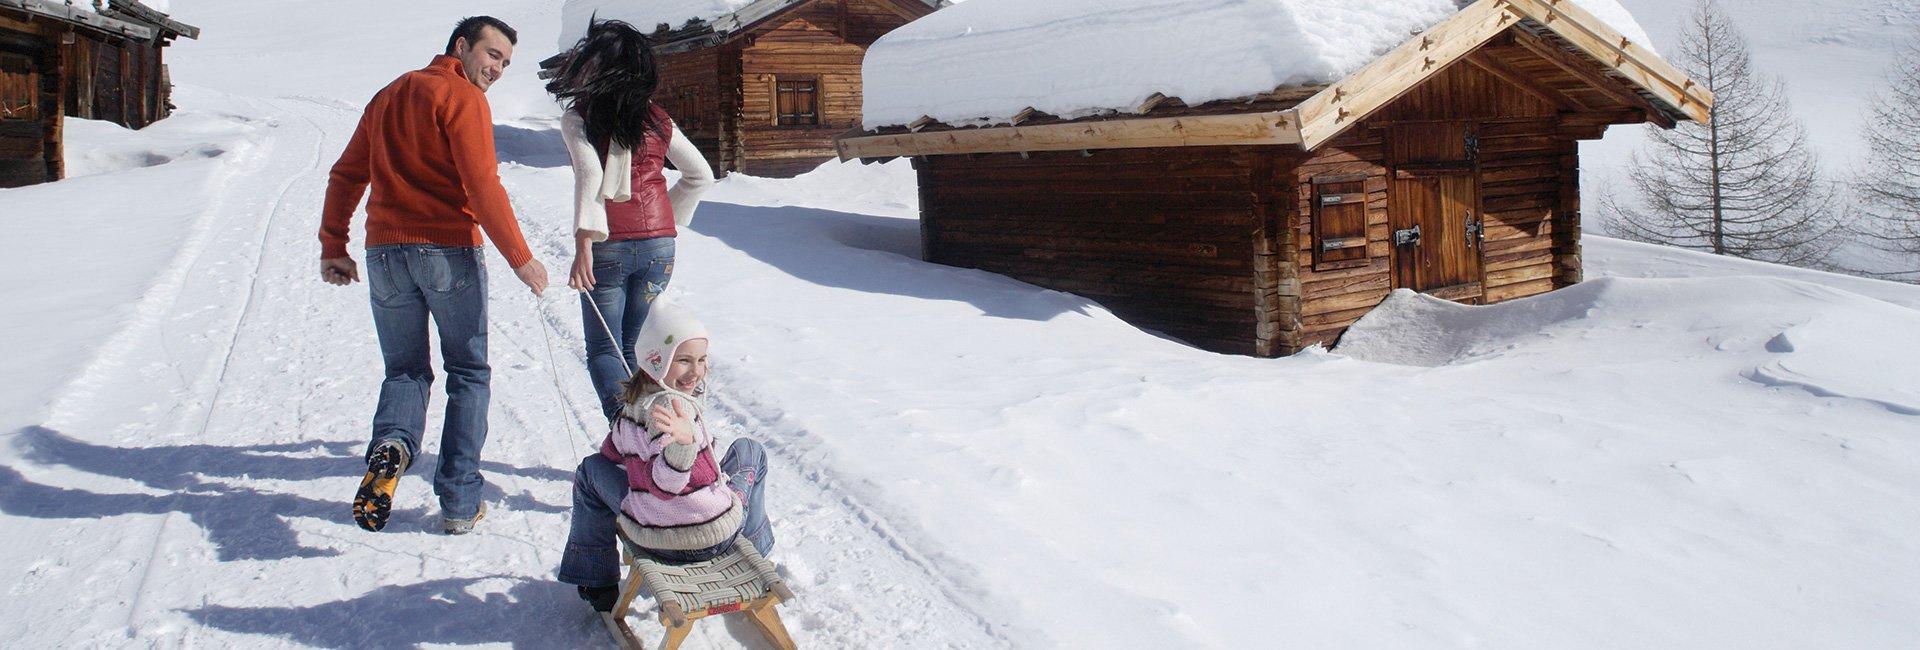 winterurlaub-suedtirol-03